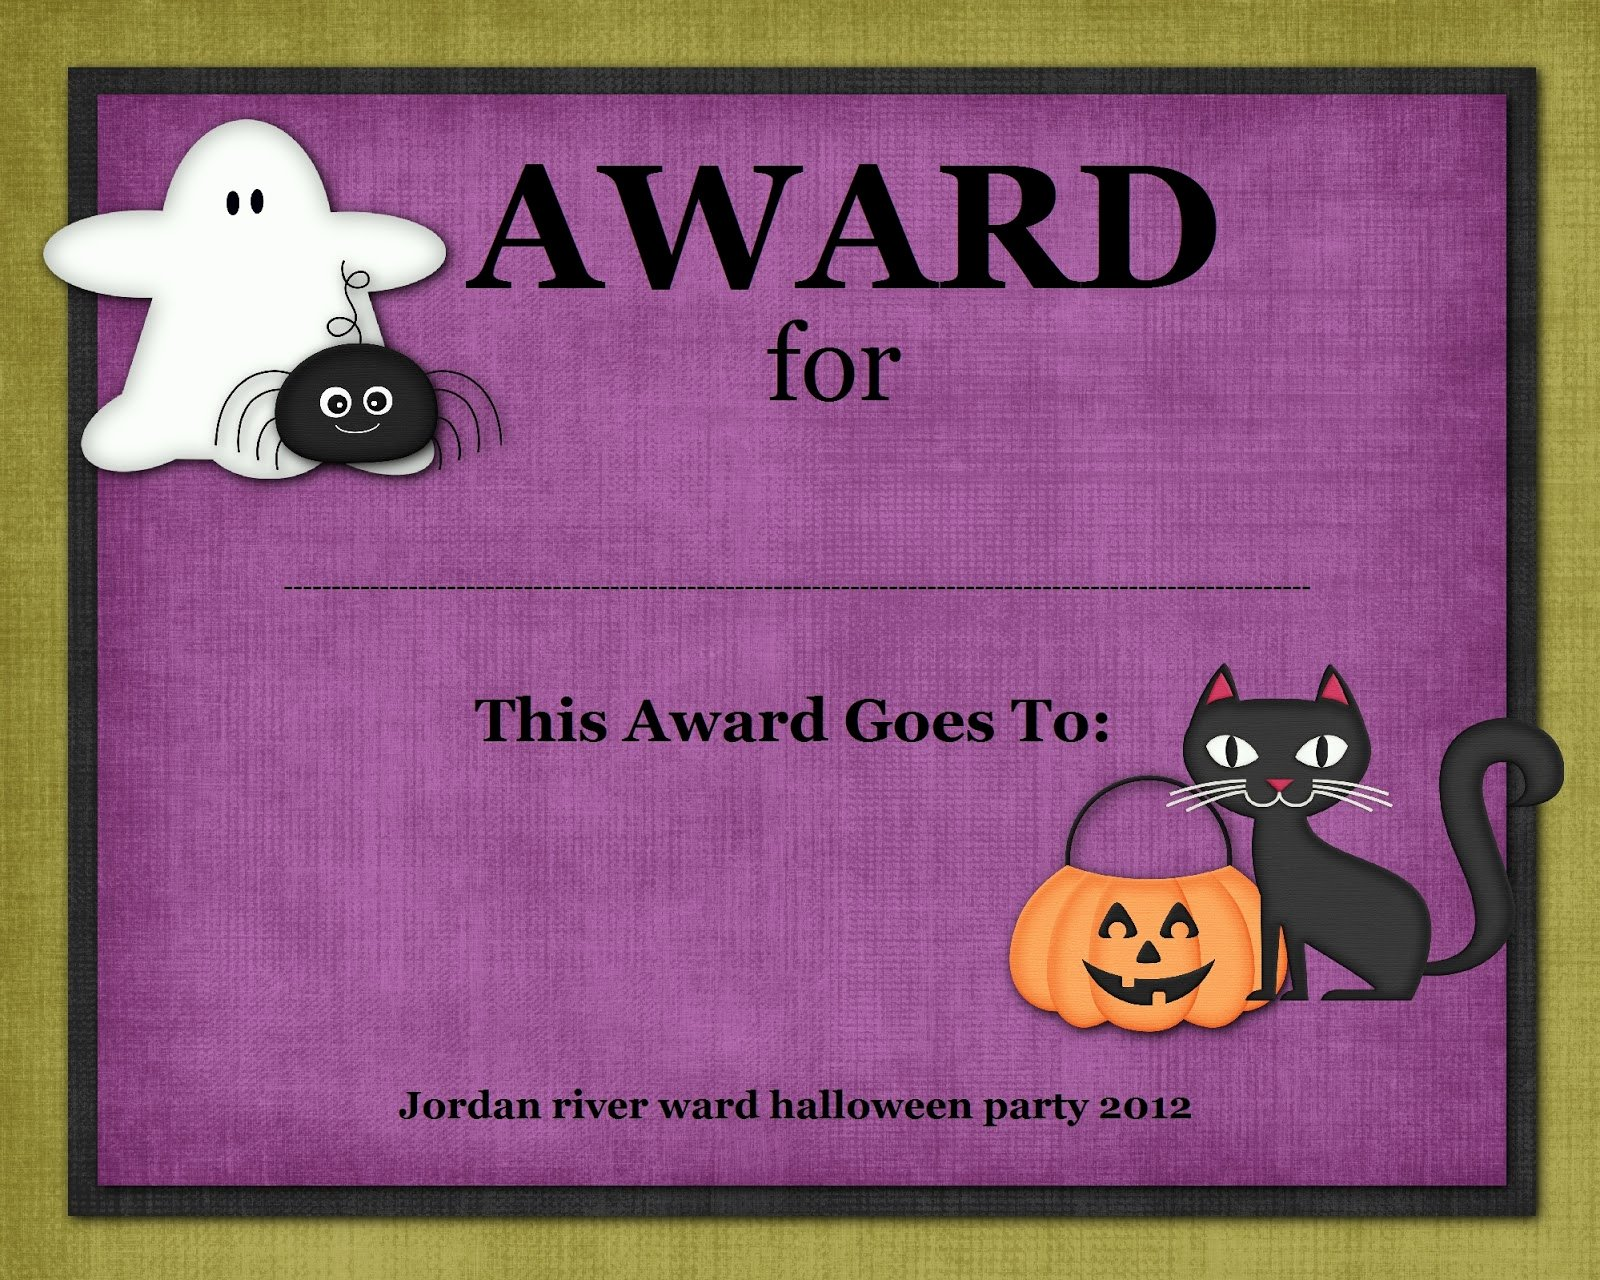 Halloween Costume Certificate Template Inspirational Digital Designs Scrapbooking Halloween Costume Contest Awards